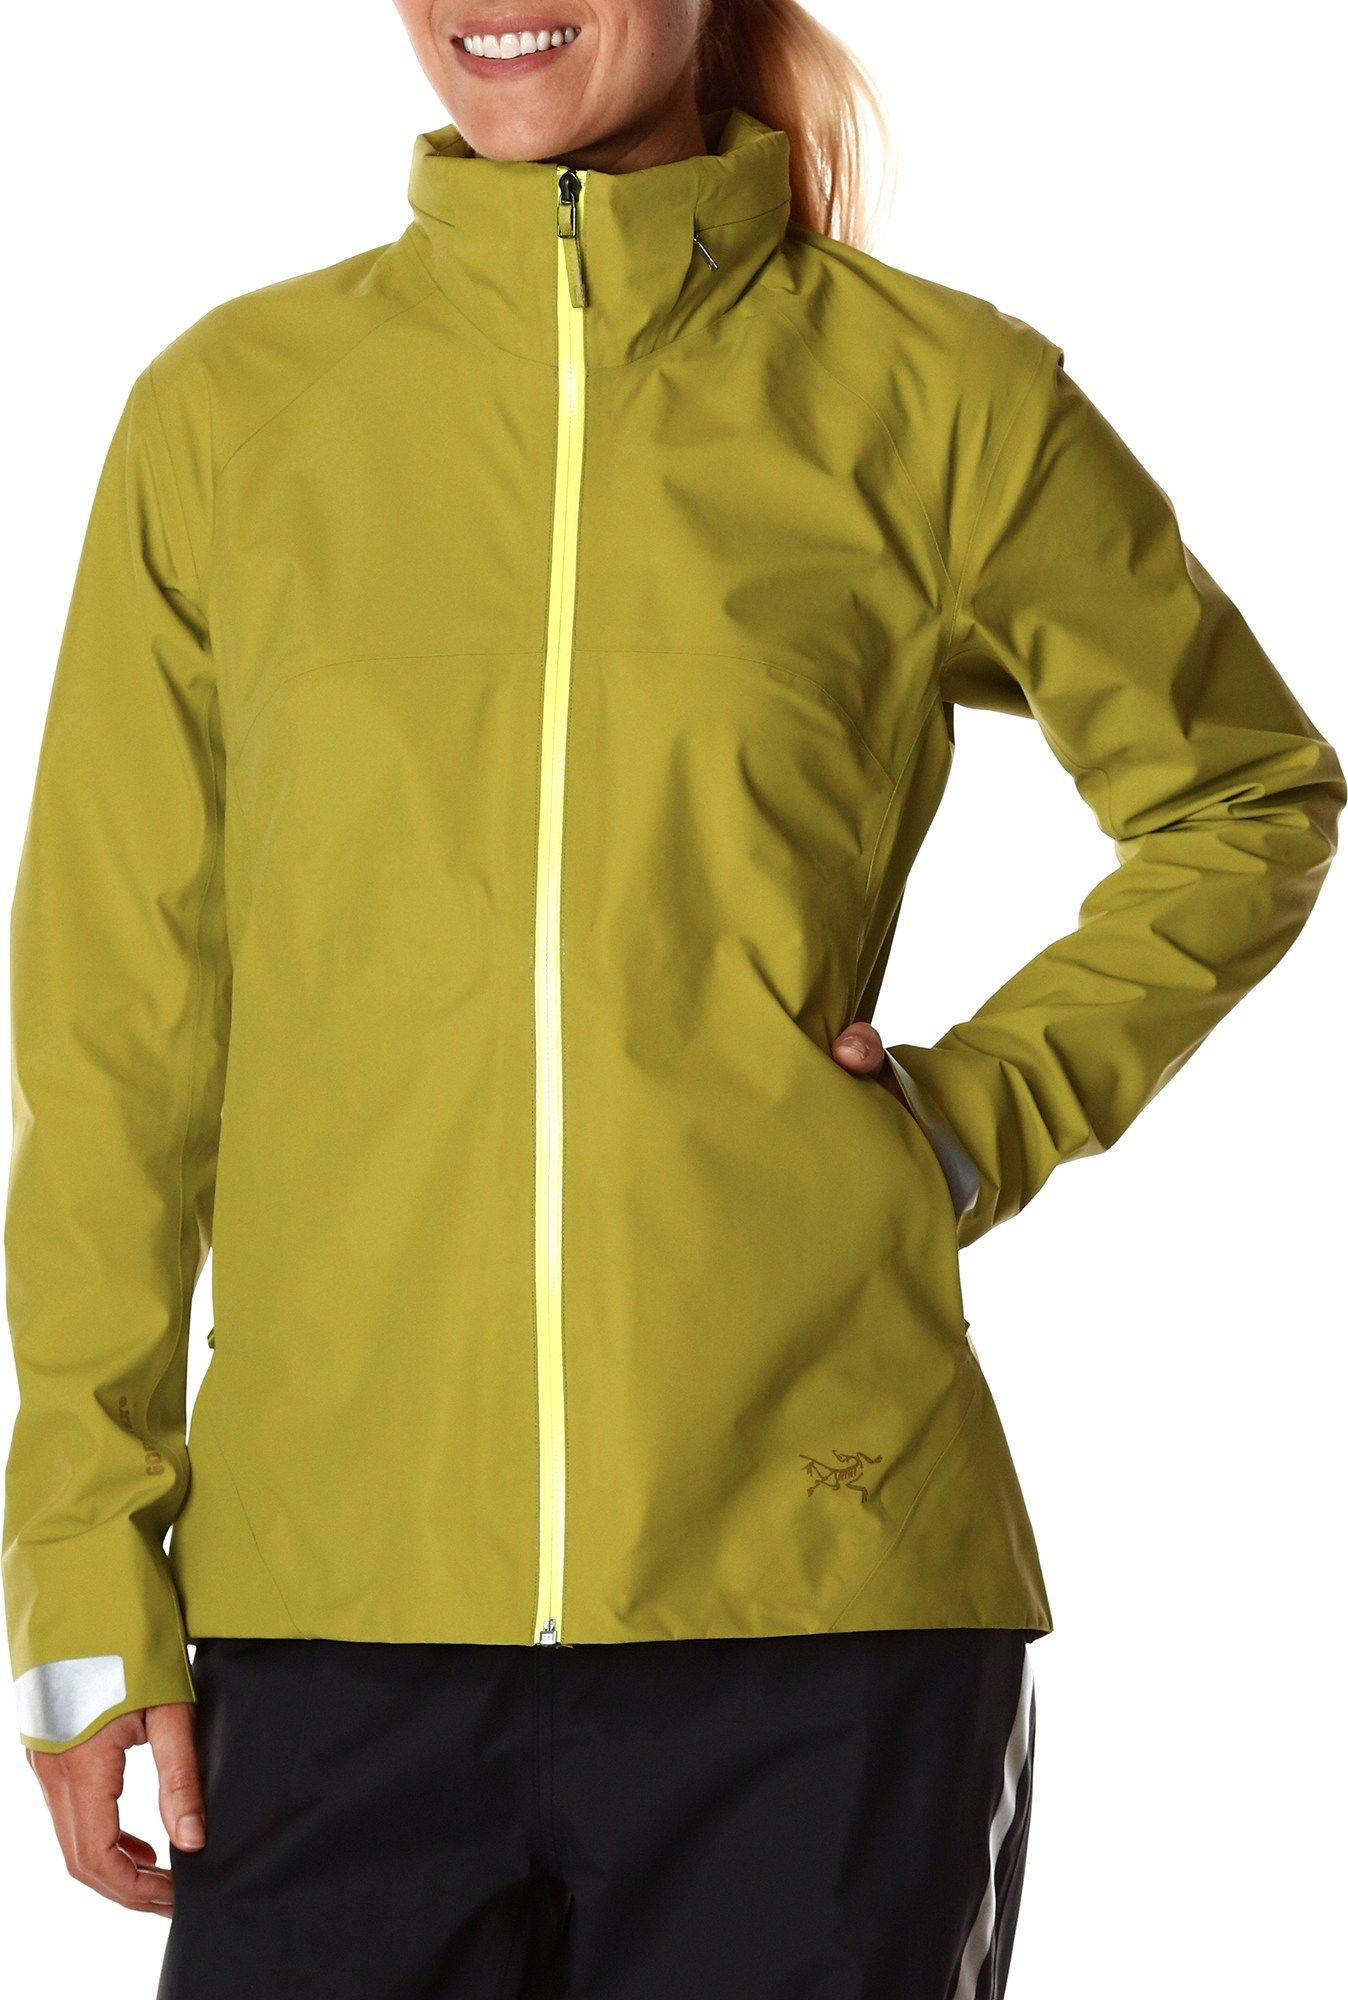 09bffbfb9 A2B Commuter Hardshell Bike Jacket - Women's   *Apparel ...